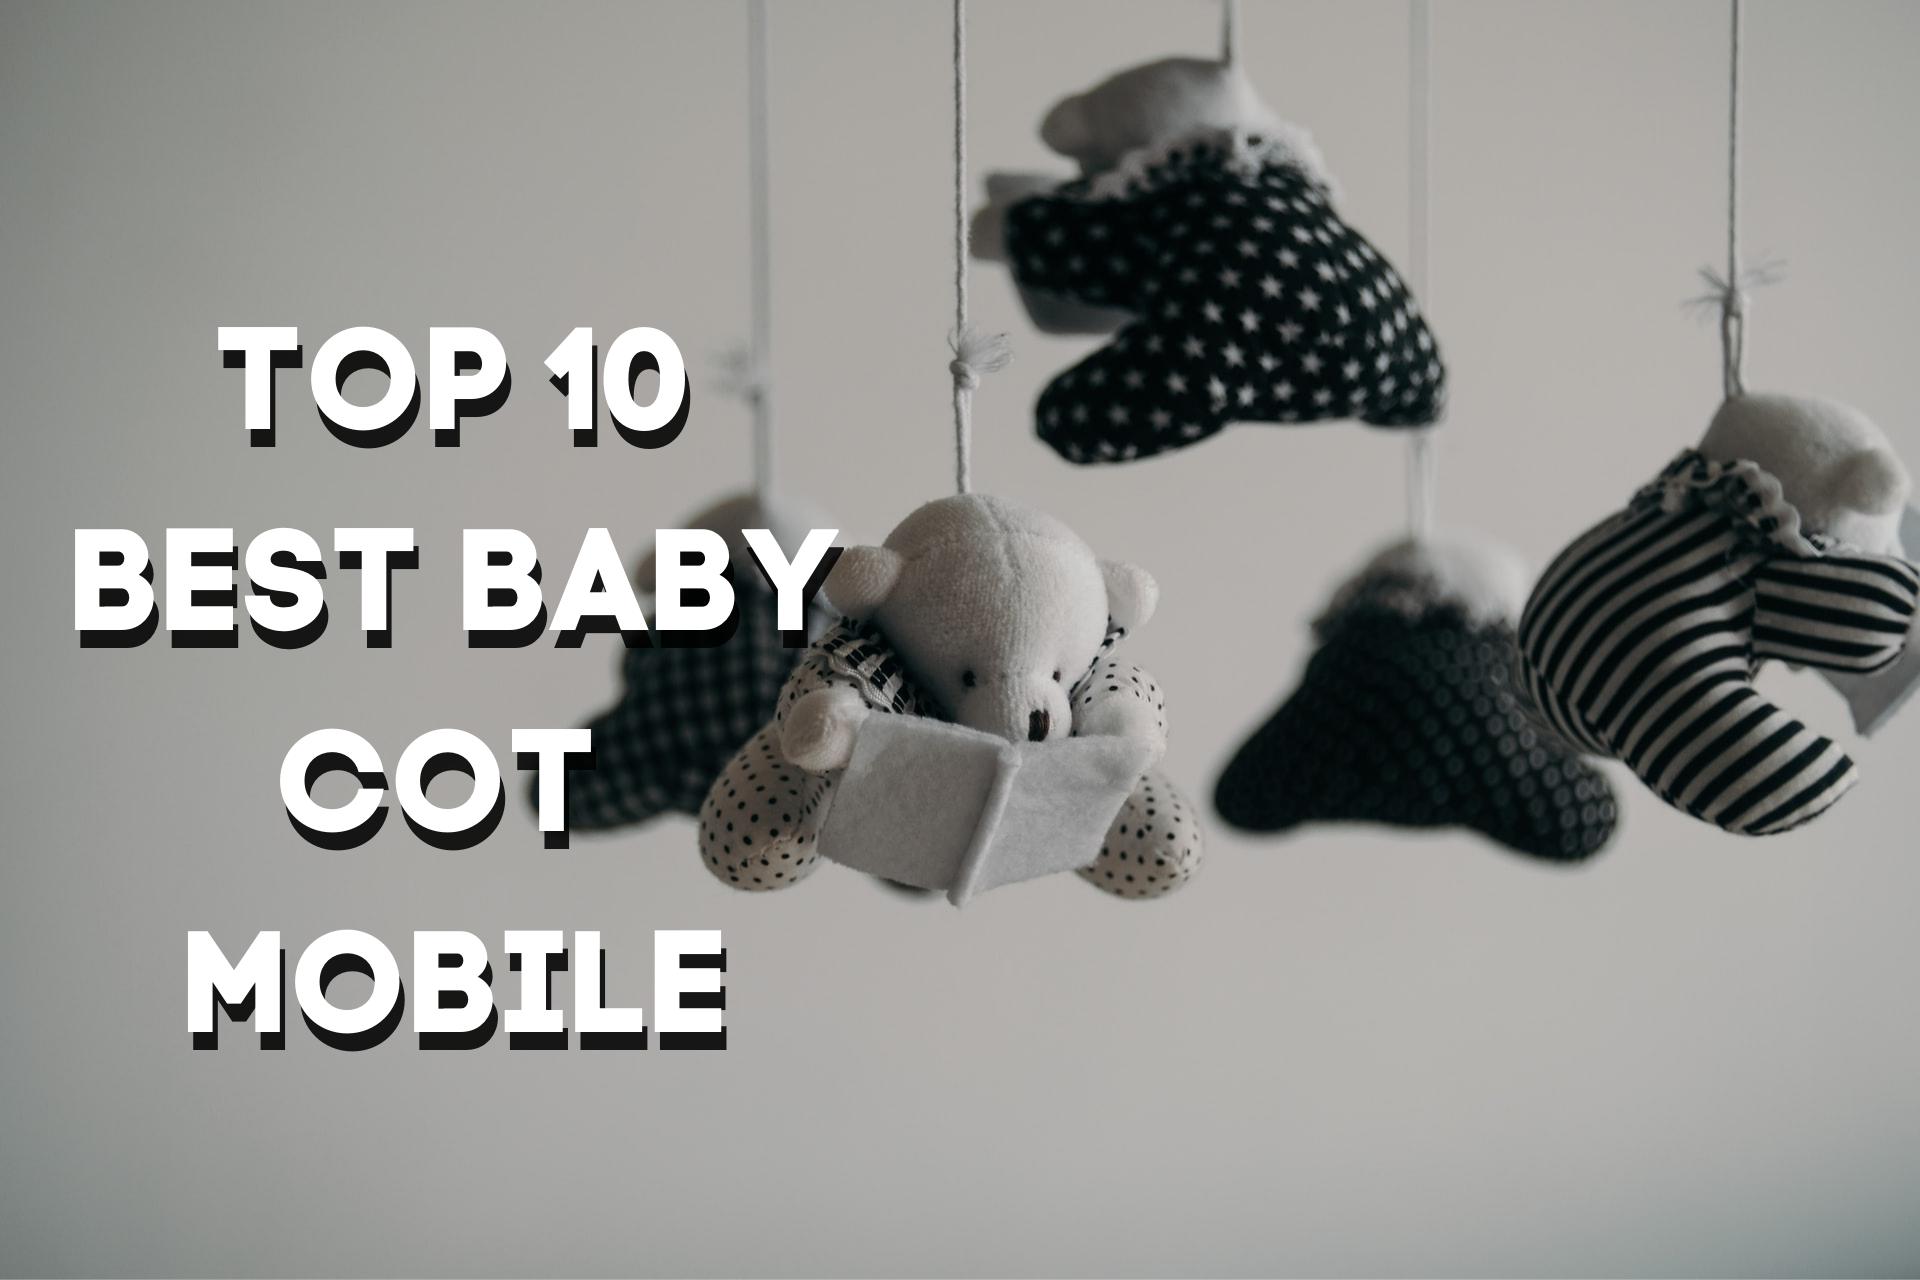 TOP 10 BEST BABY COT MOBILE